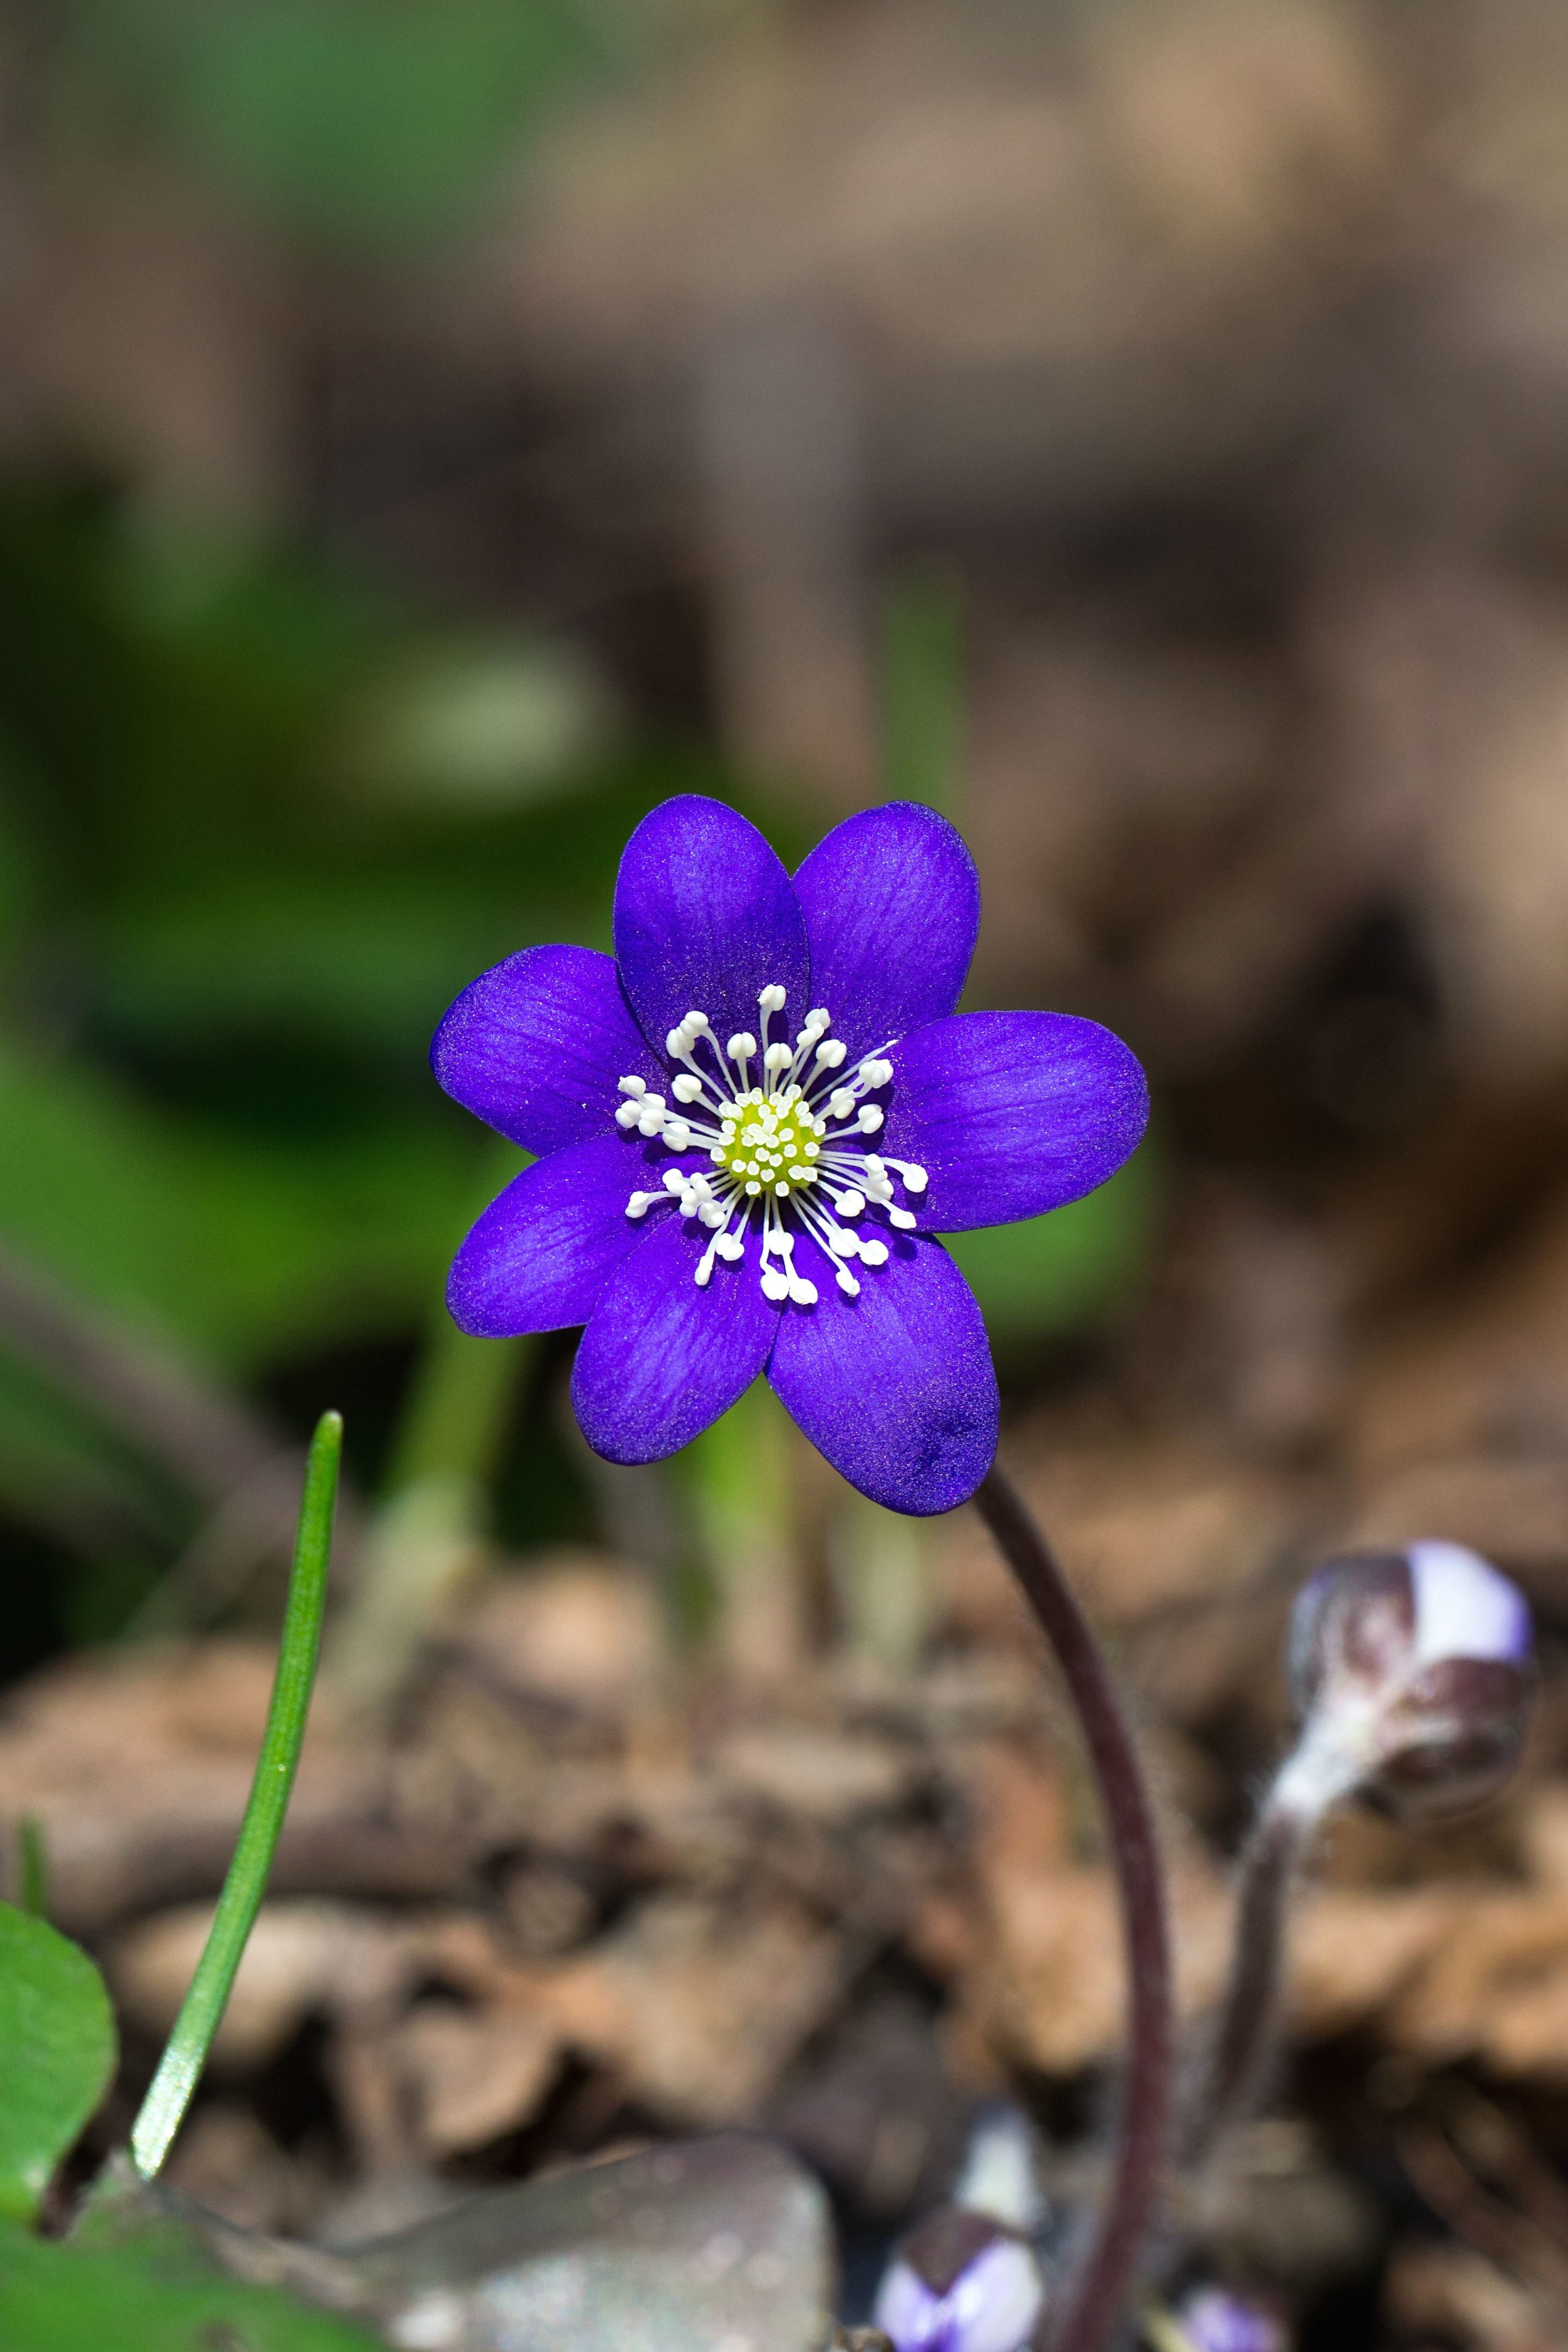 Free picture nature plant flora flower bloom color